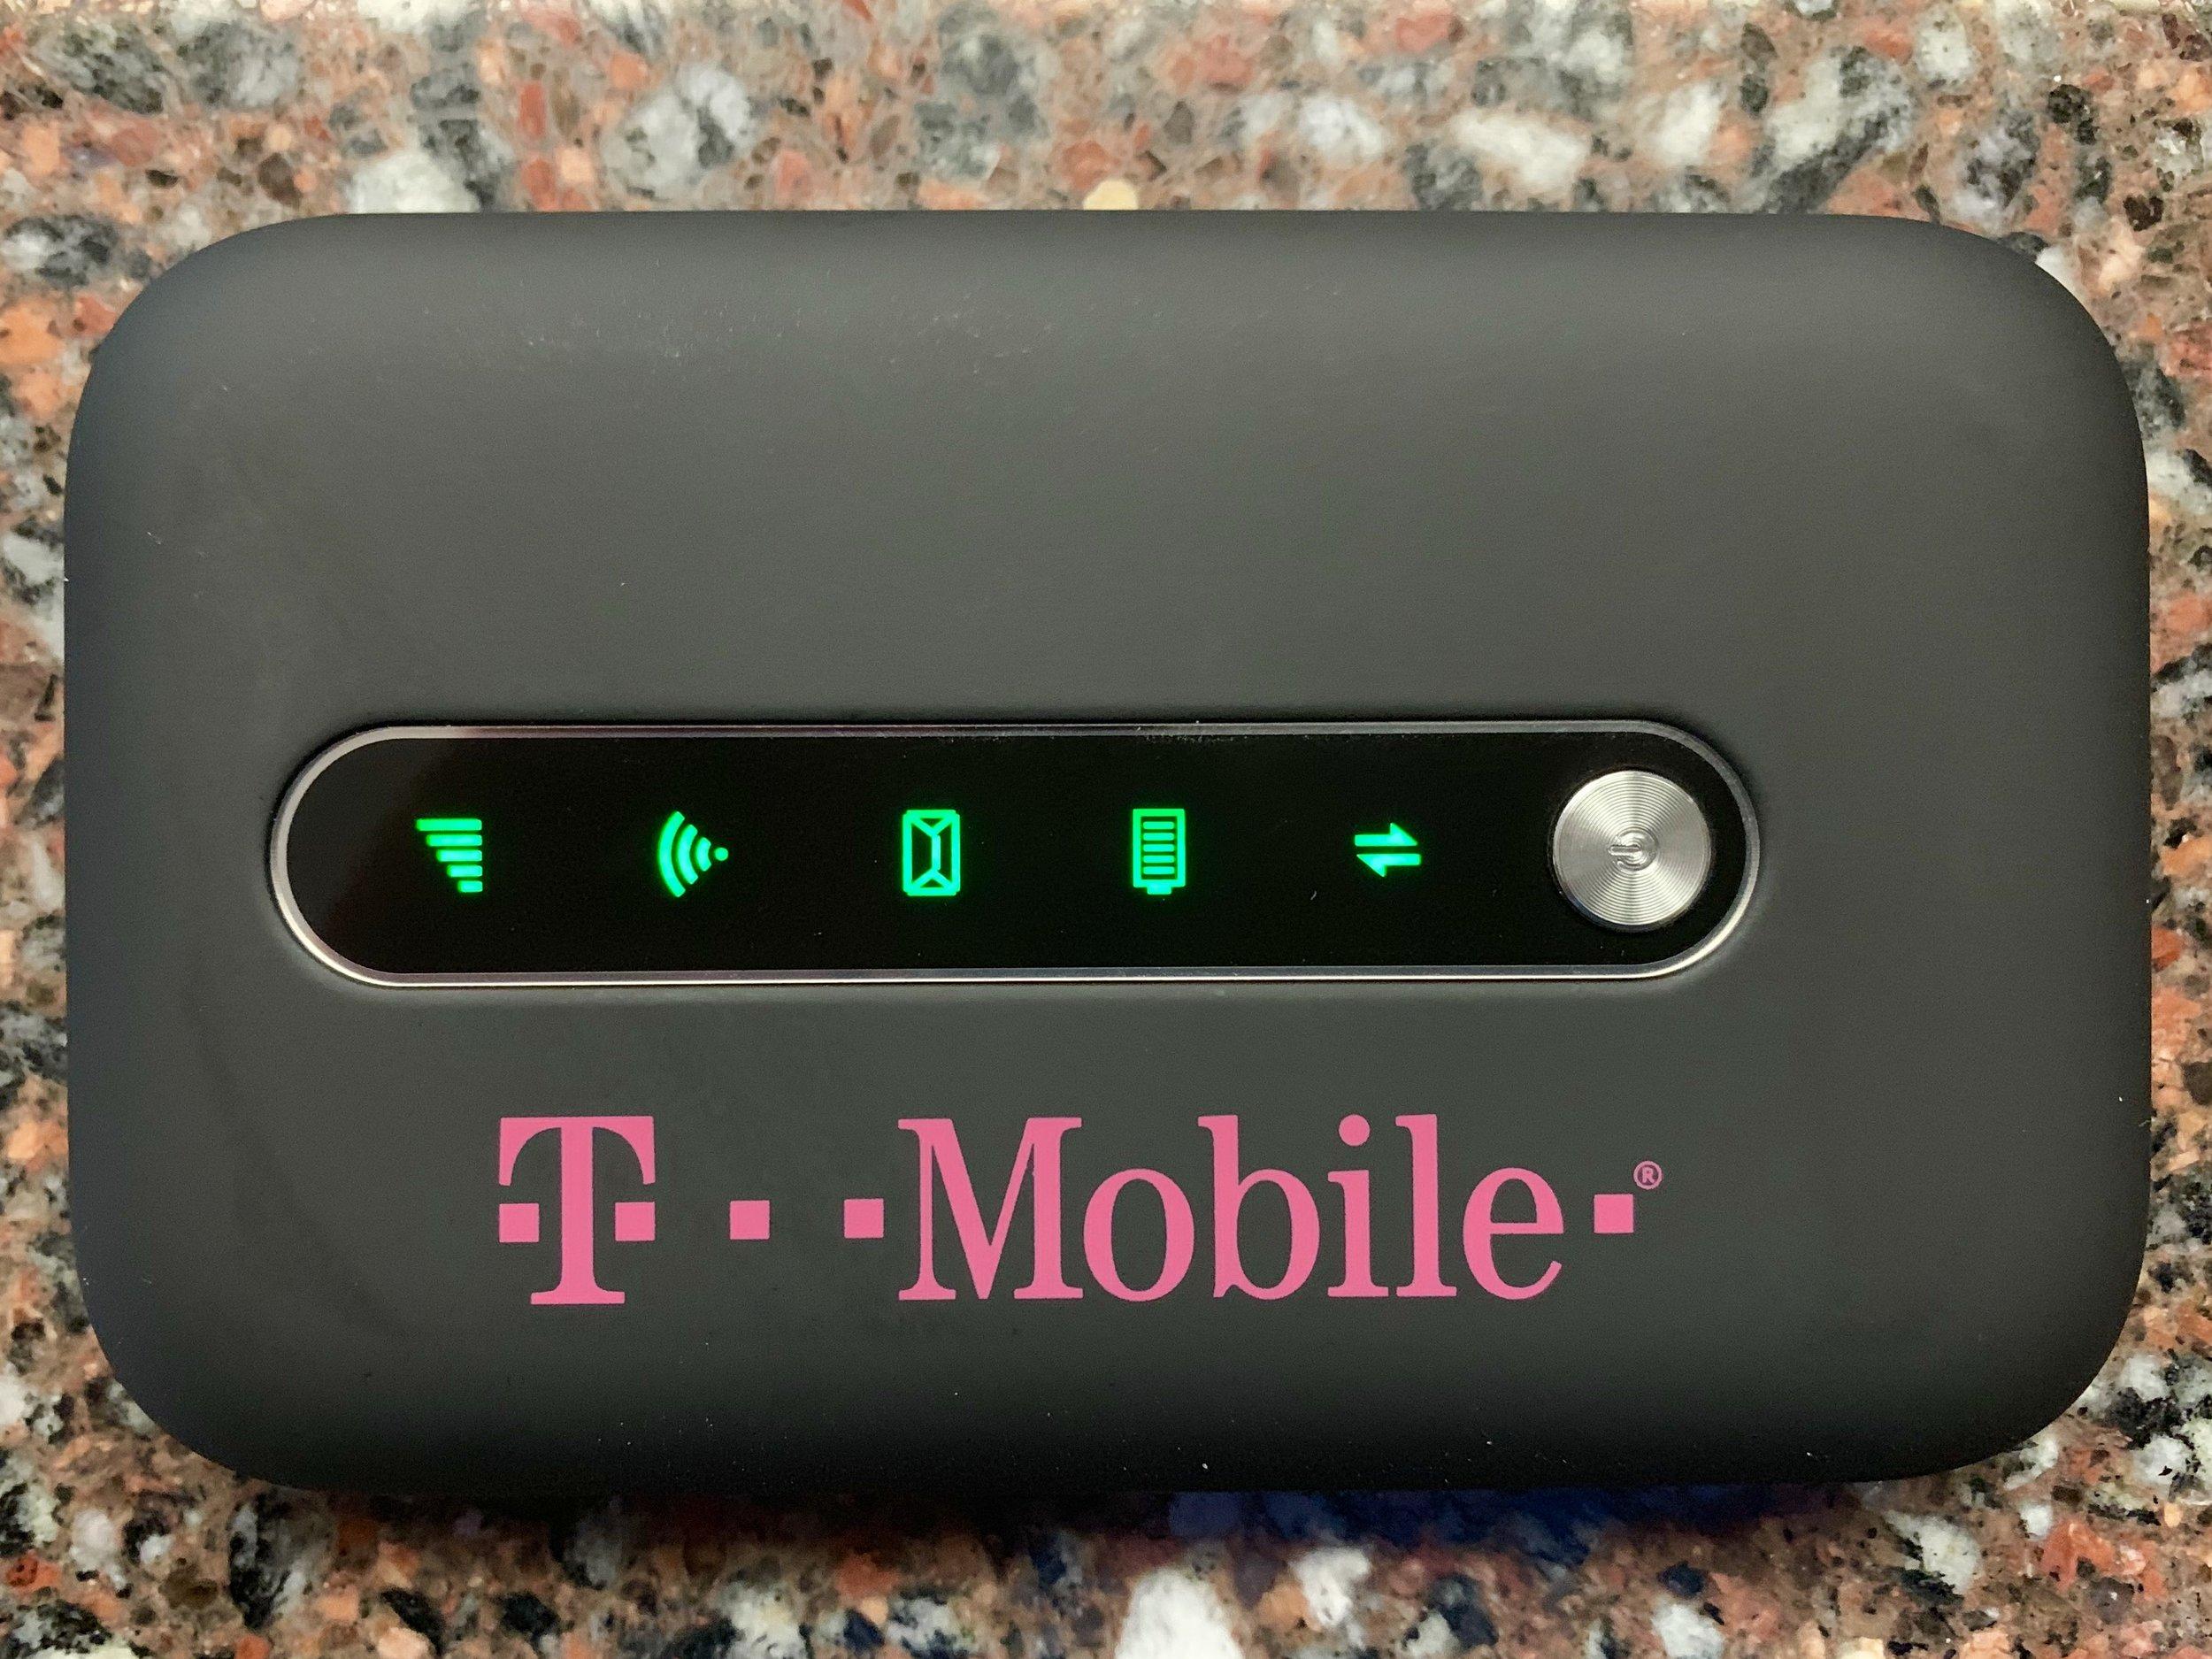 T-Mobile Test Drive hotspot. Photo ©2019, Steven Sande